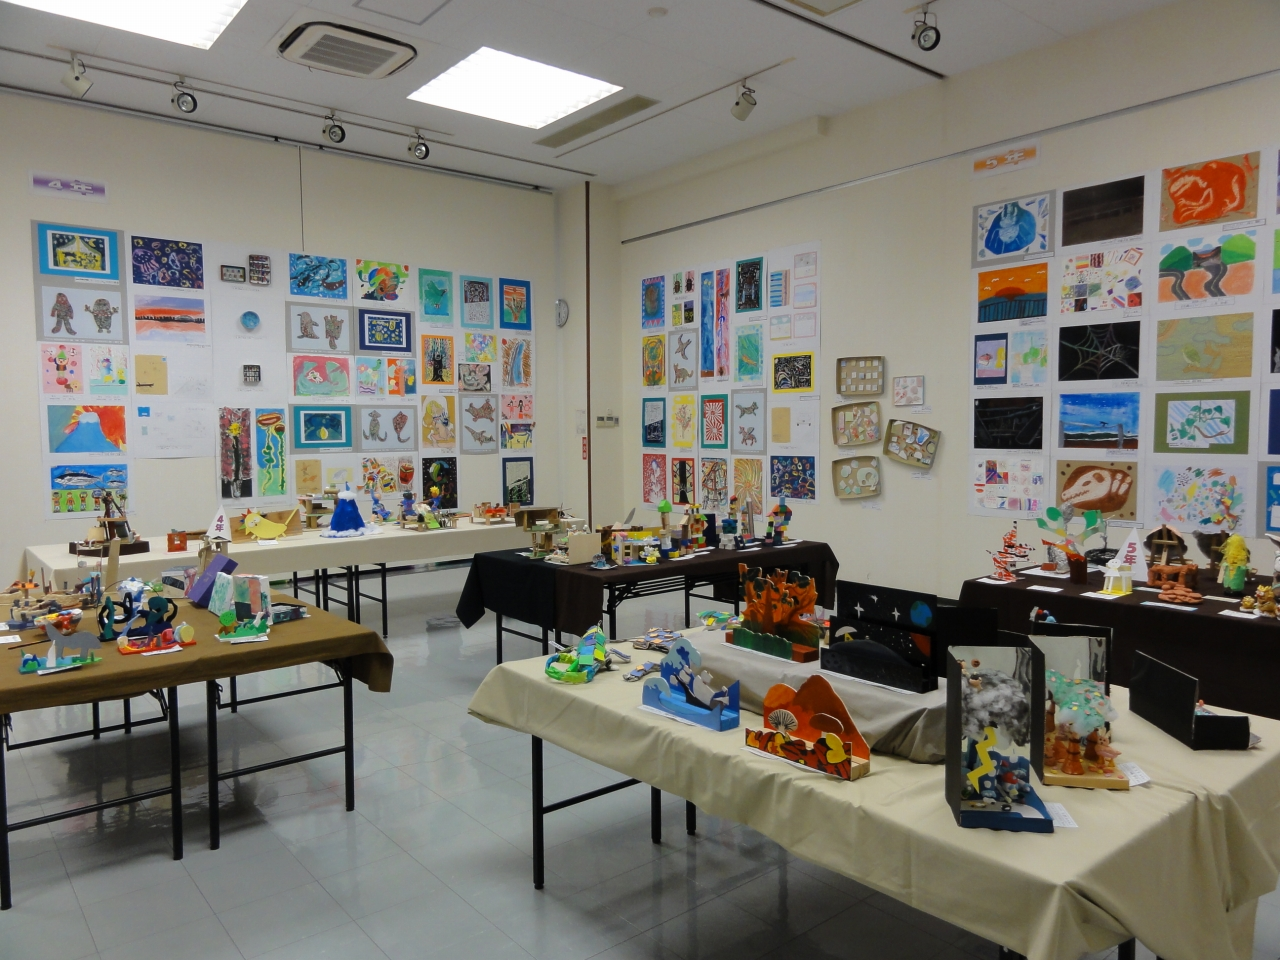 のビル展(新宿区立小学校図画工作作品展)